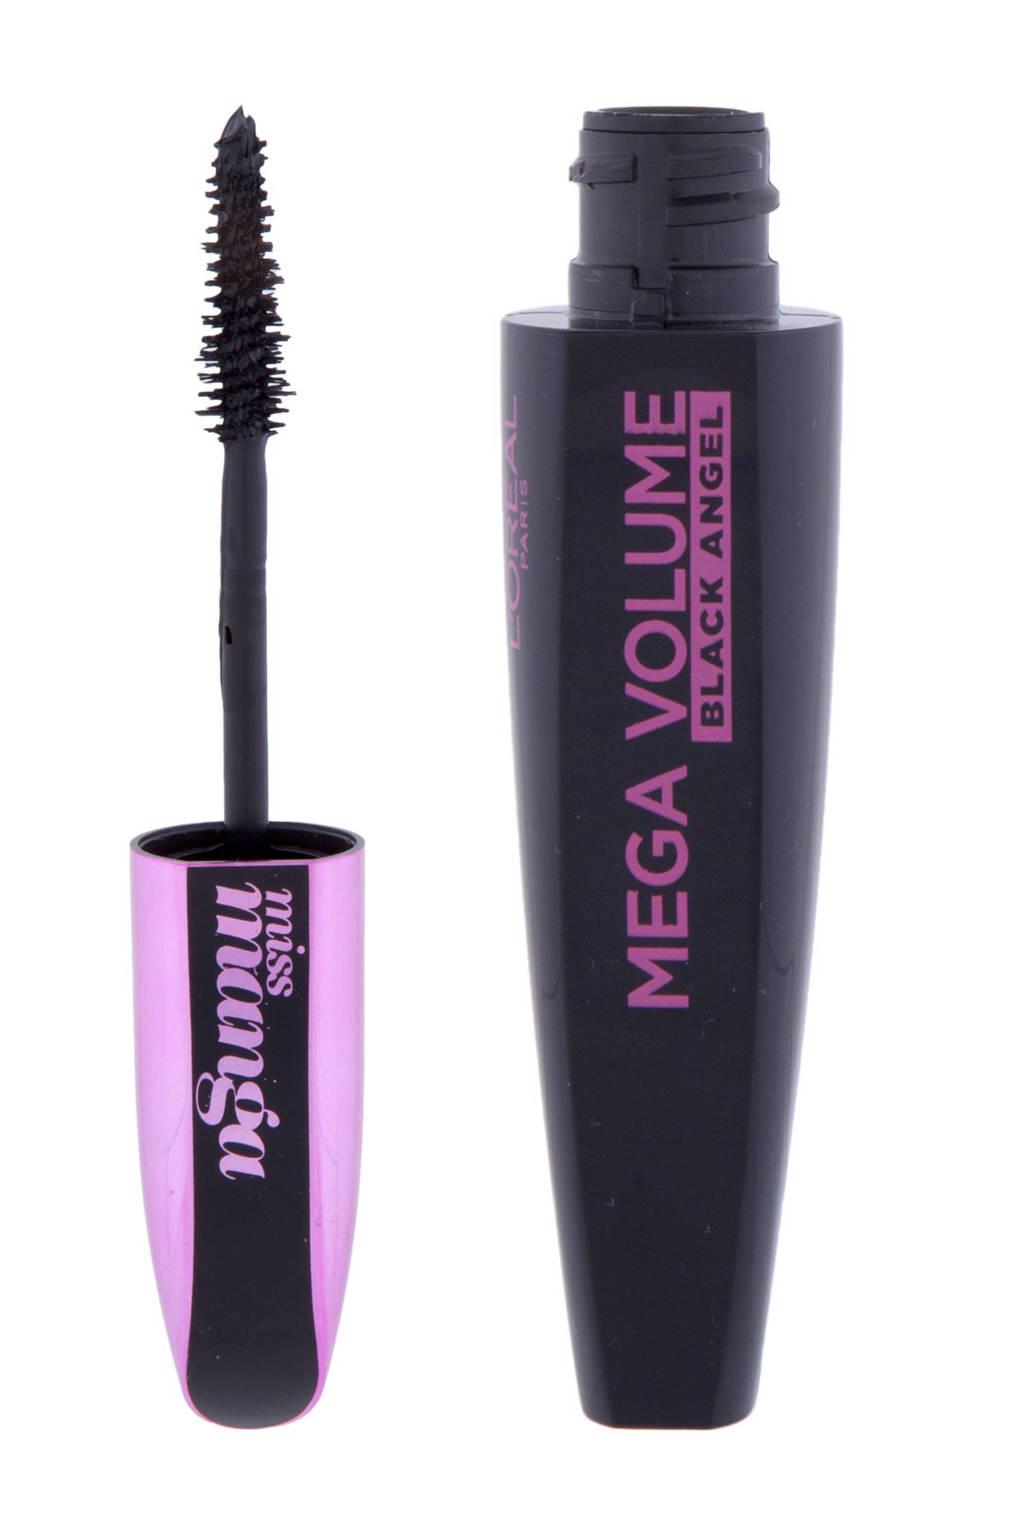 L'Oréal Paris Mega Volume Miss Manga Black Angel mascara - 01 Black, Zwart